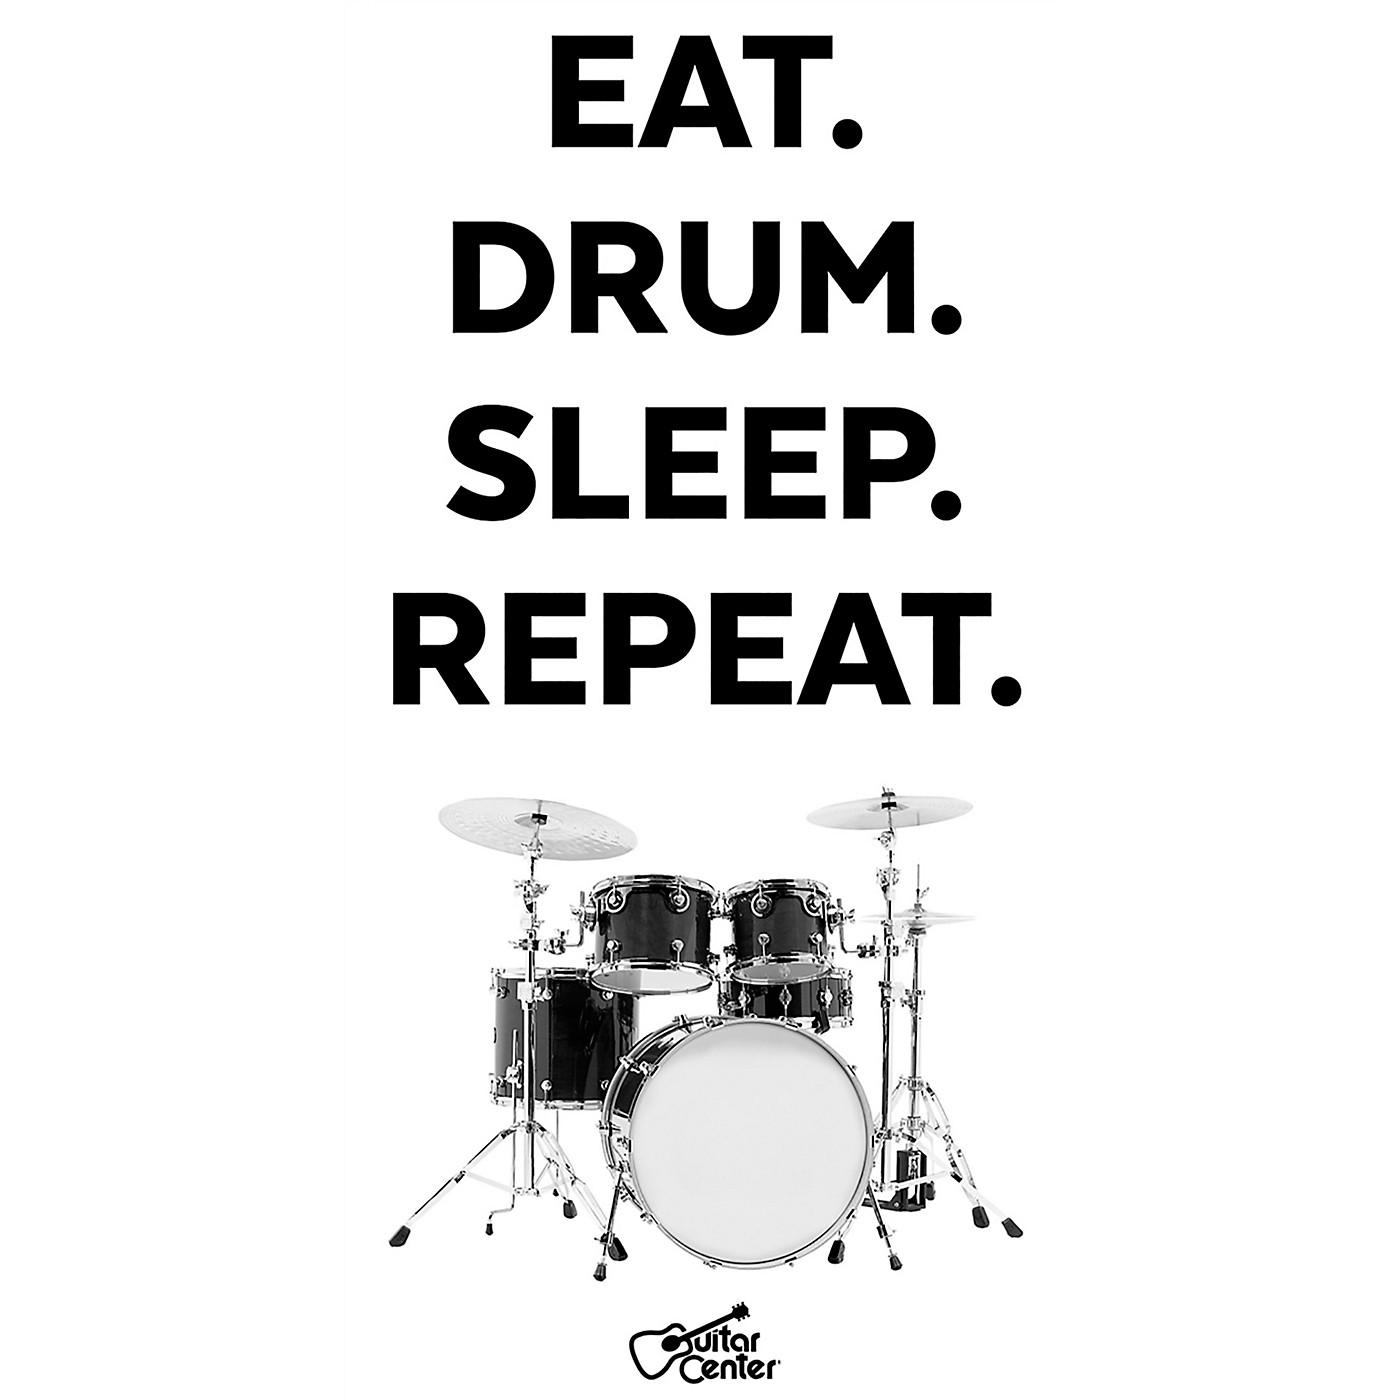 Guitar Center Eat, Drum, Sleep, Repeat - Black/White Sticker thumbnail